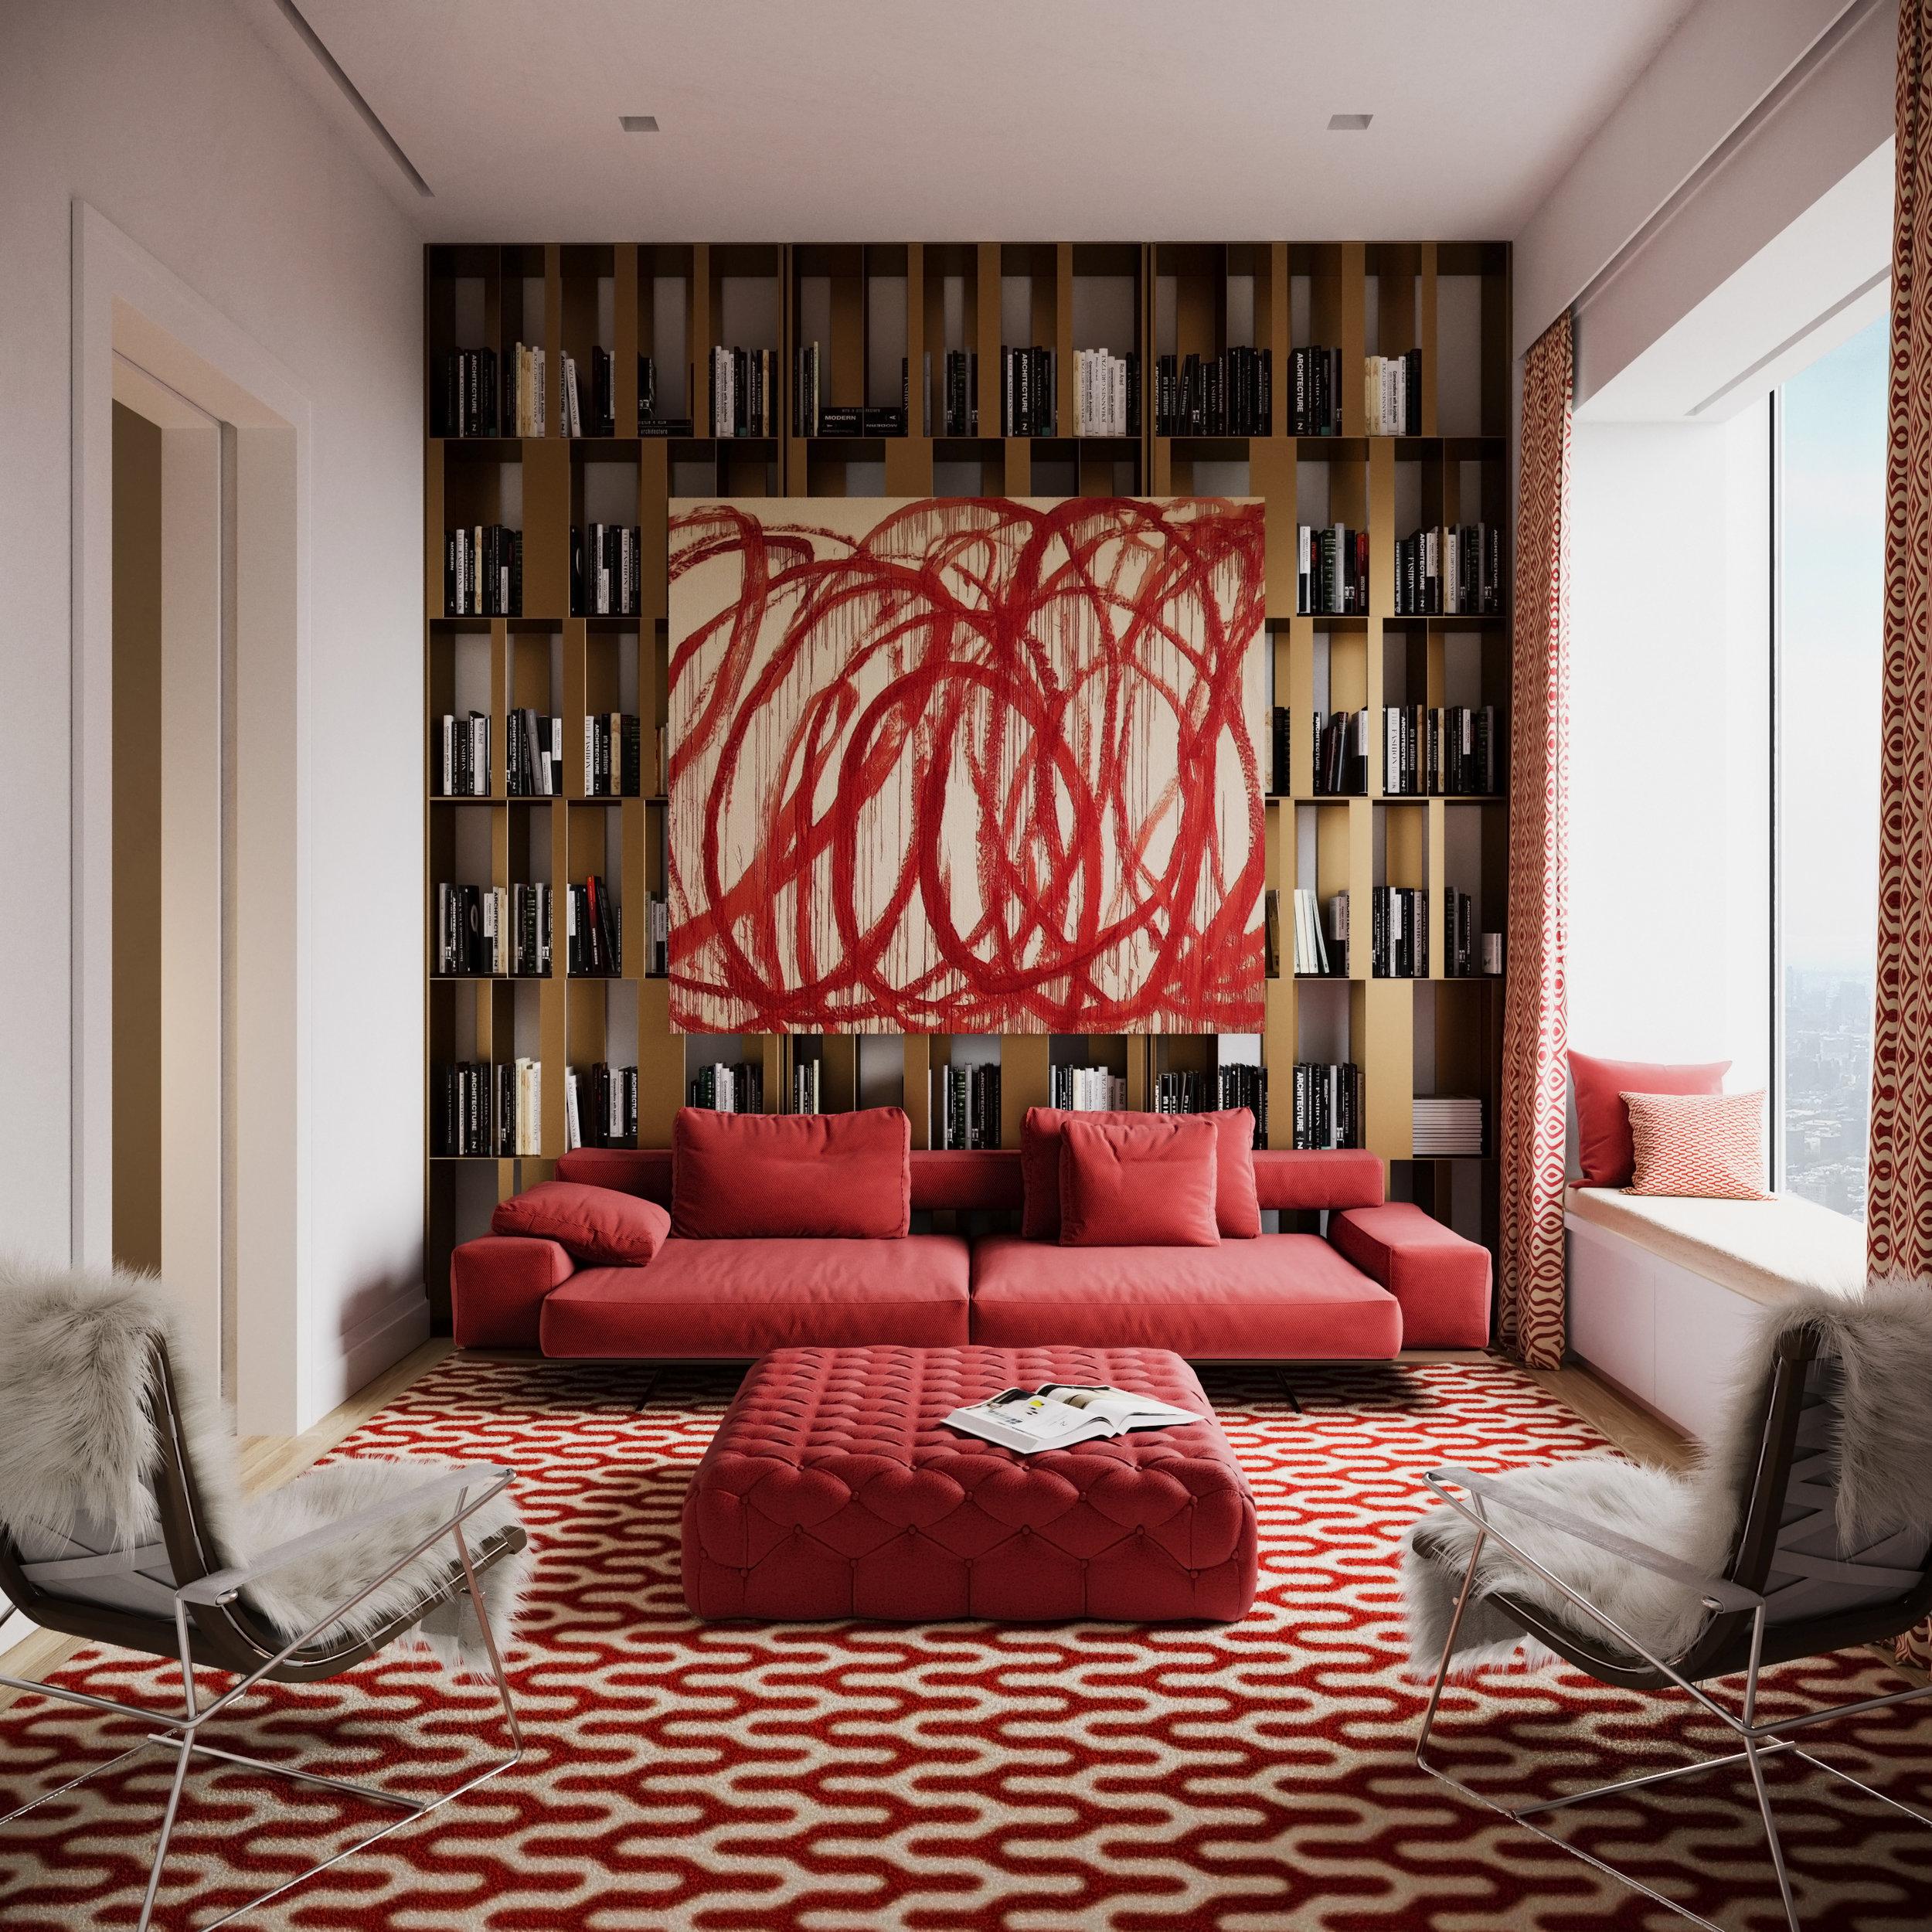 Axis Mundi Architects Interior Designers New York Chicago San Francisco Axis Mundi Design New York